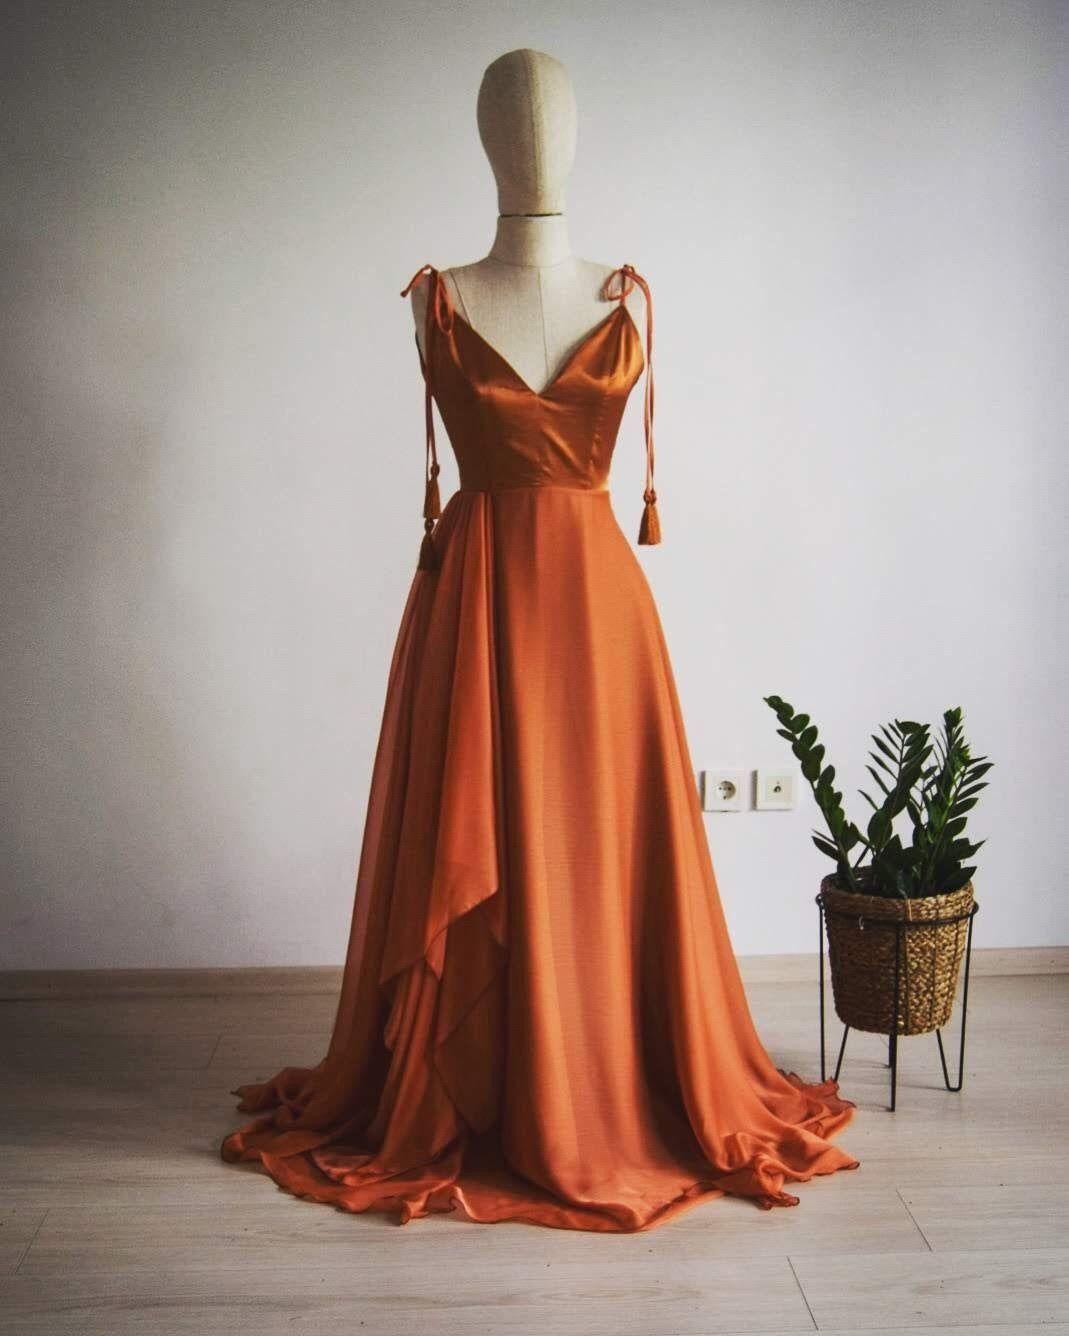 Georgette Silk Chiffon With Top Satin Copper Bridesmaid Dress Etsy 1000 Orange Bridesmaid Dresses Burnt Orange Bridesmaid Dresses Copper Bridesmaid Dresses [ 1336 x 1069 Pixel ]